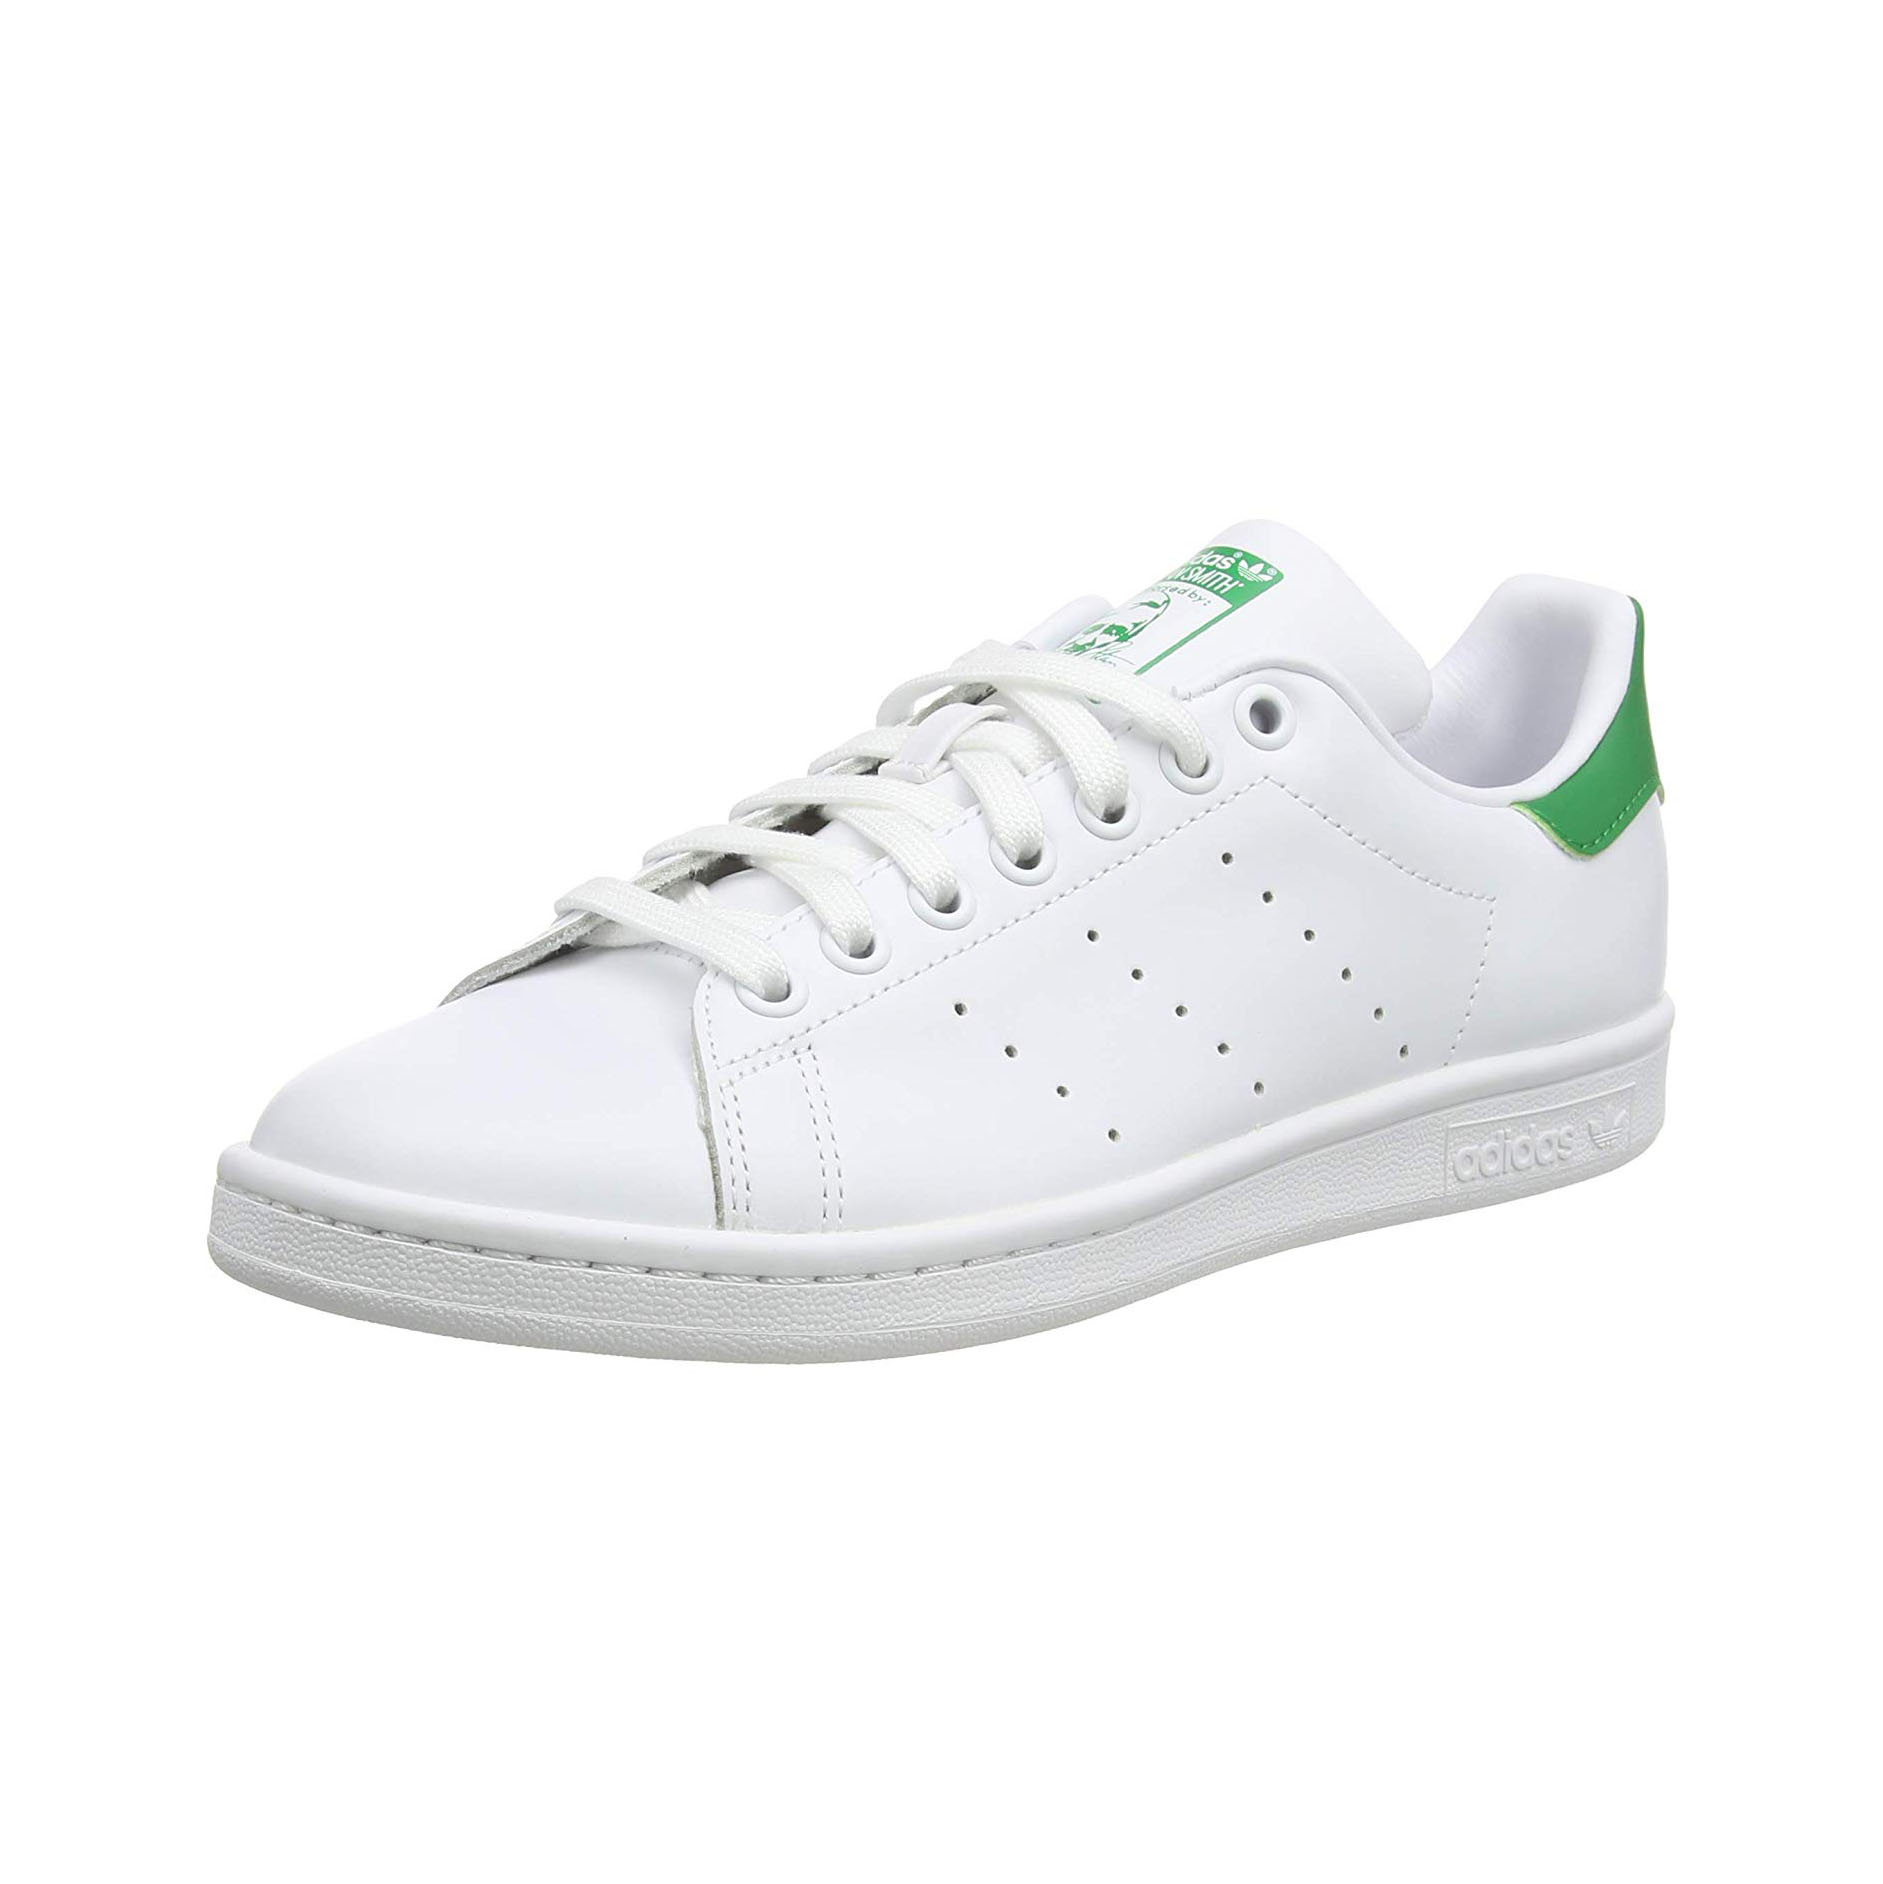 adidas stan smith verdi offerte